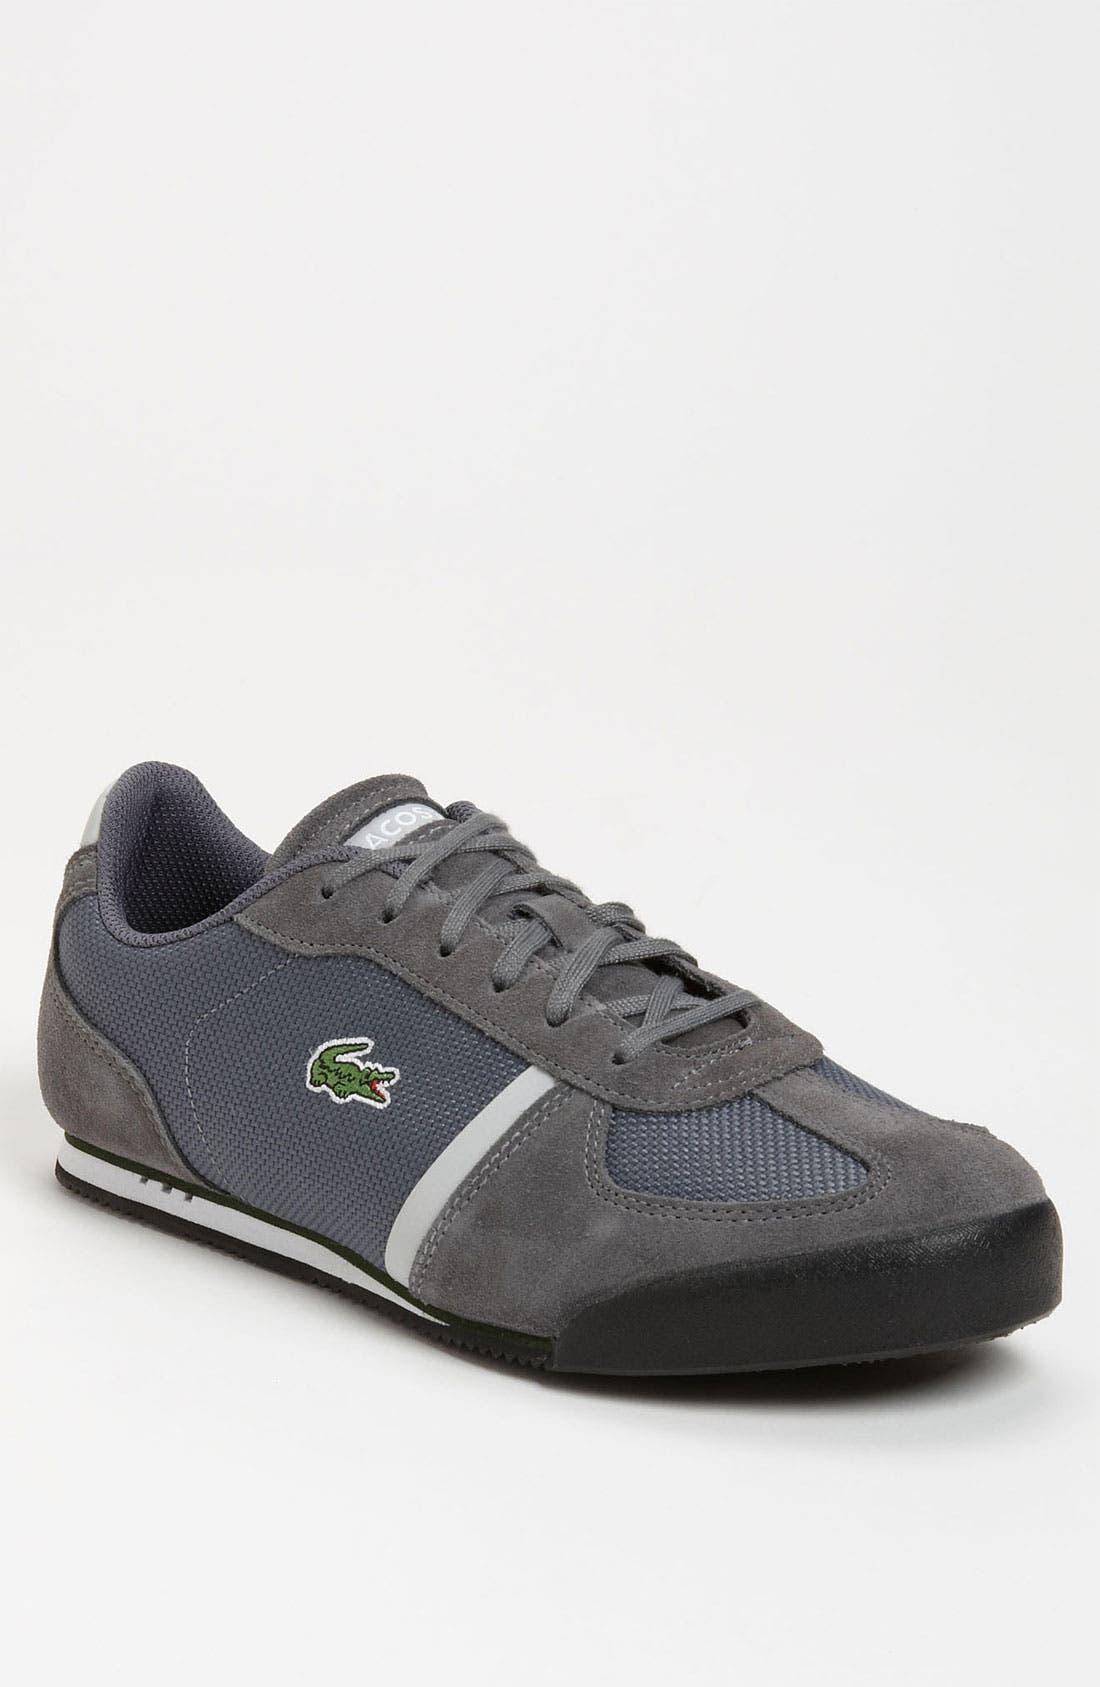 Main Image - Lacoste 'Aleron CIW' Sneaker